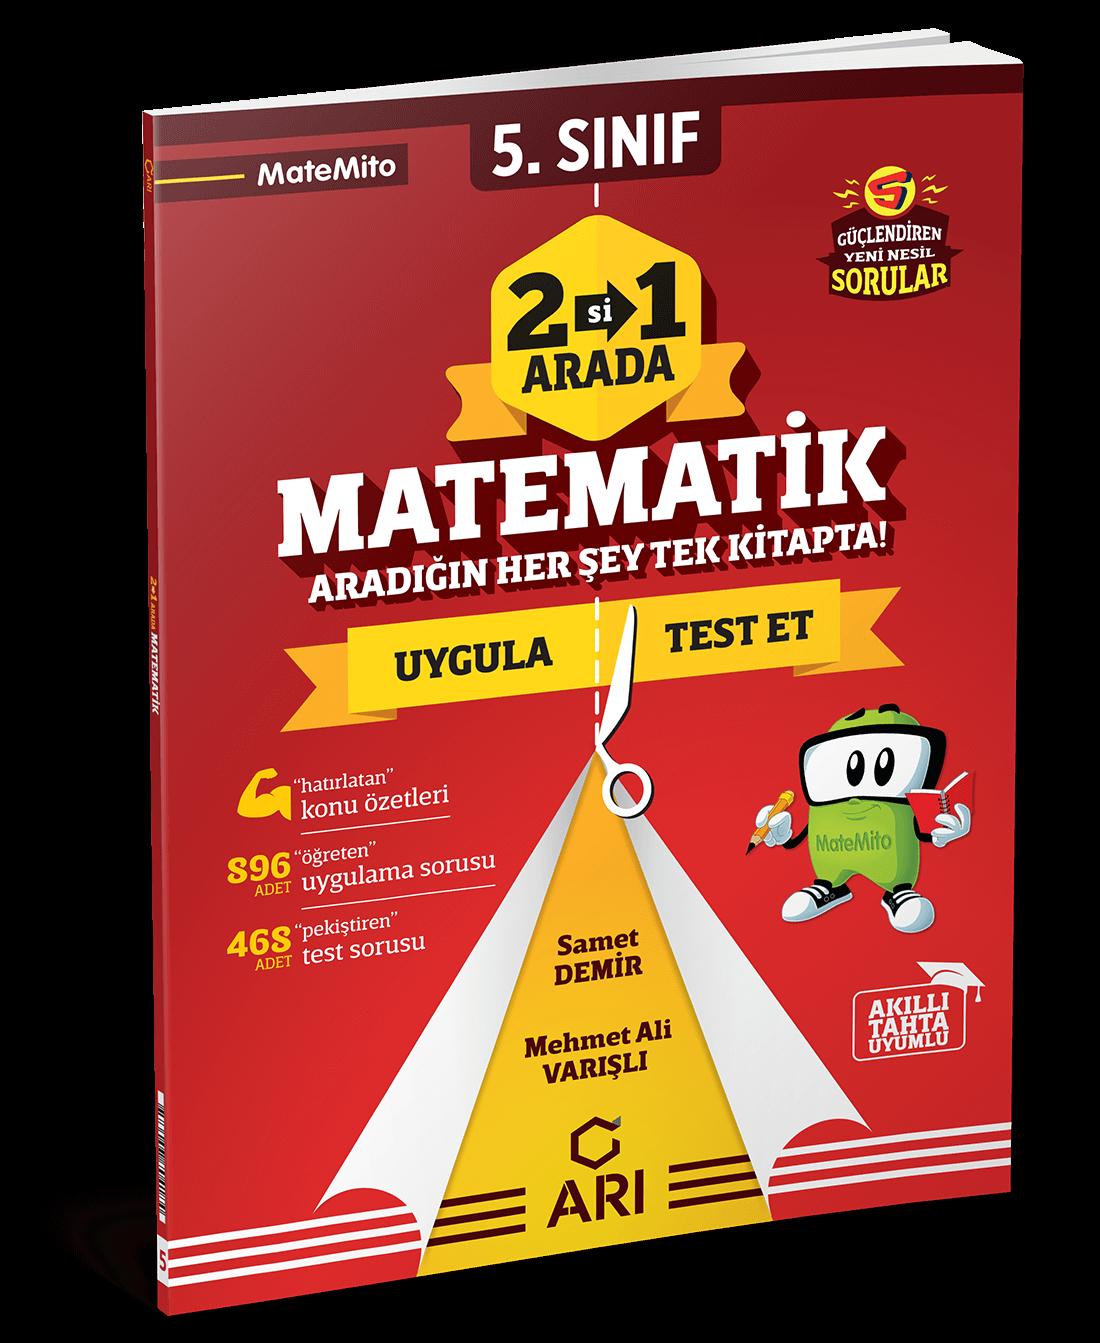 5.Sınıf Matemito 2'si 1 Arada Matematik